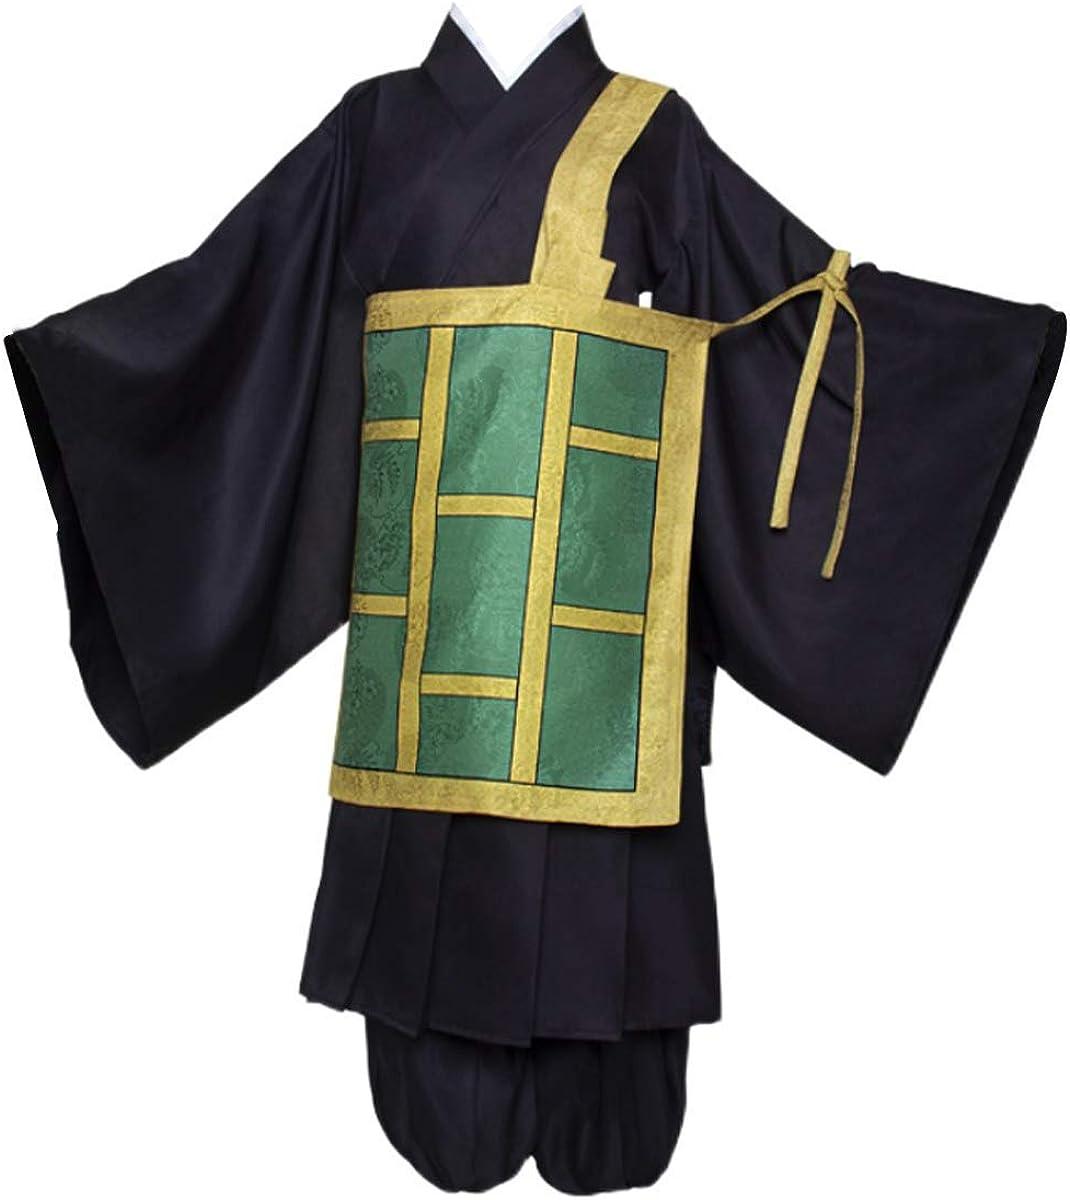 Ayazan Anime Jujutsu Kaisen Cosplay Uniform Top Halloween Costume